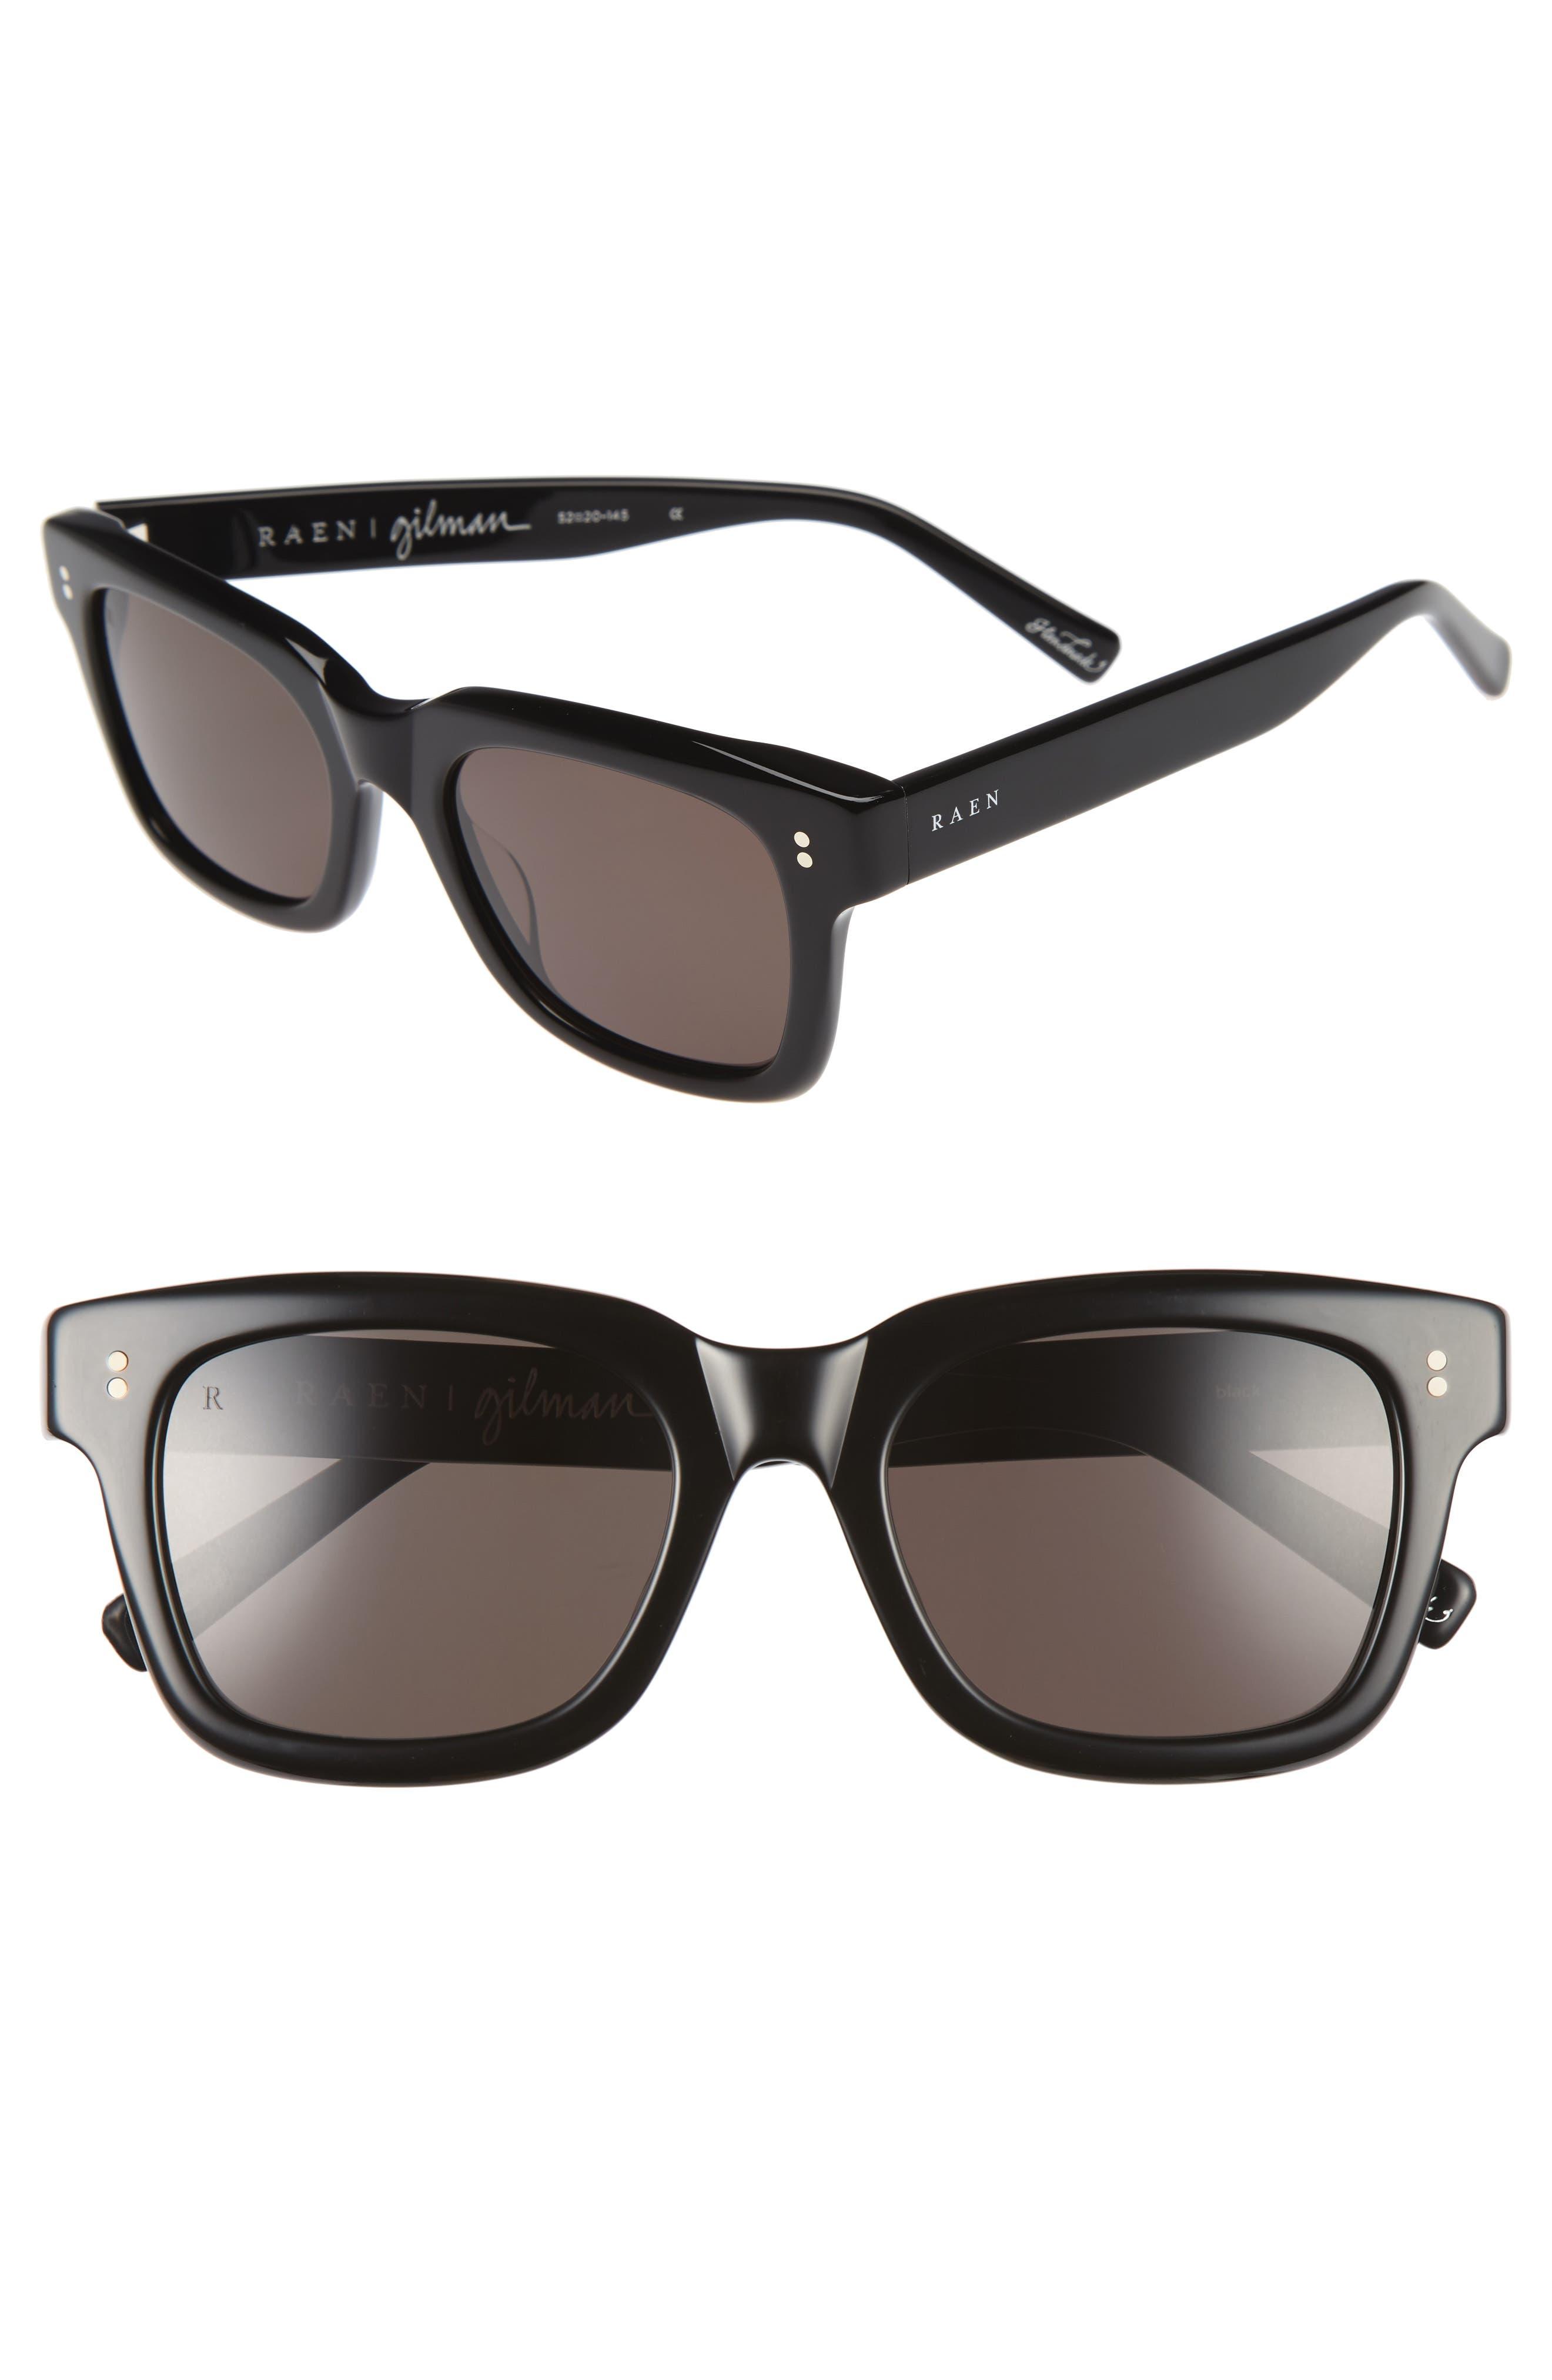 Main Image - RAEN Gilman 52mm Sunglasses